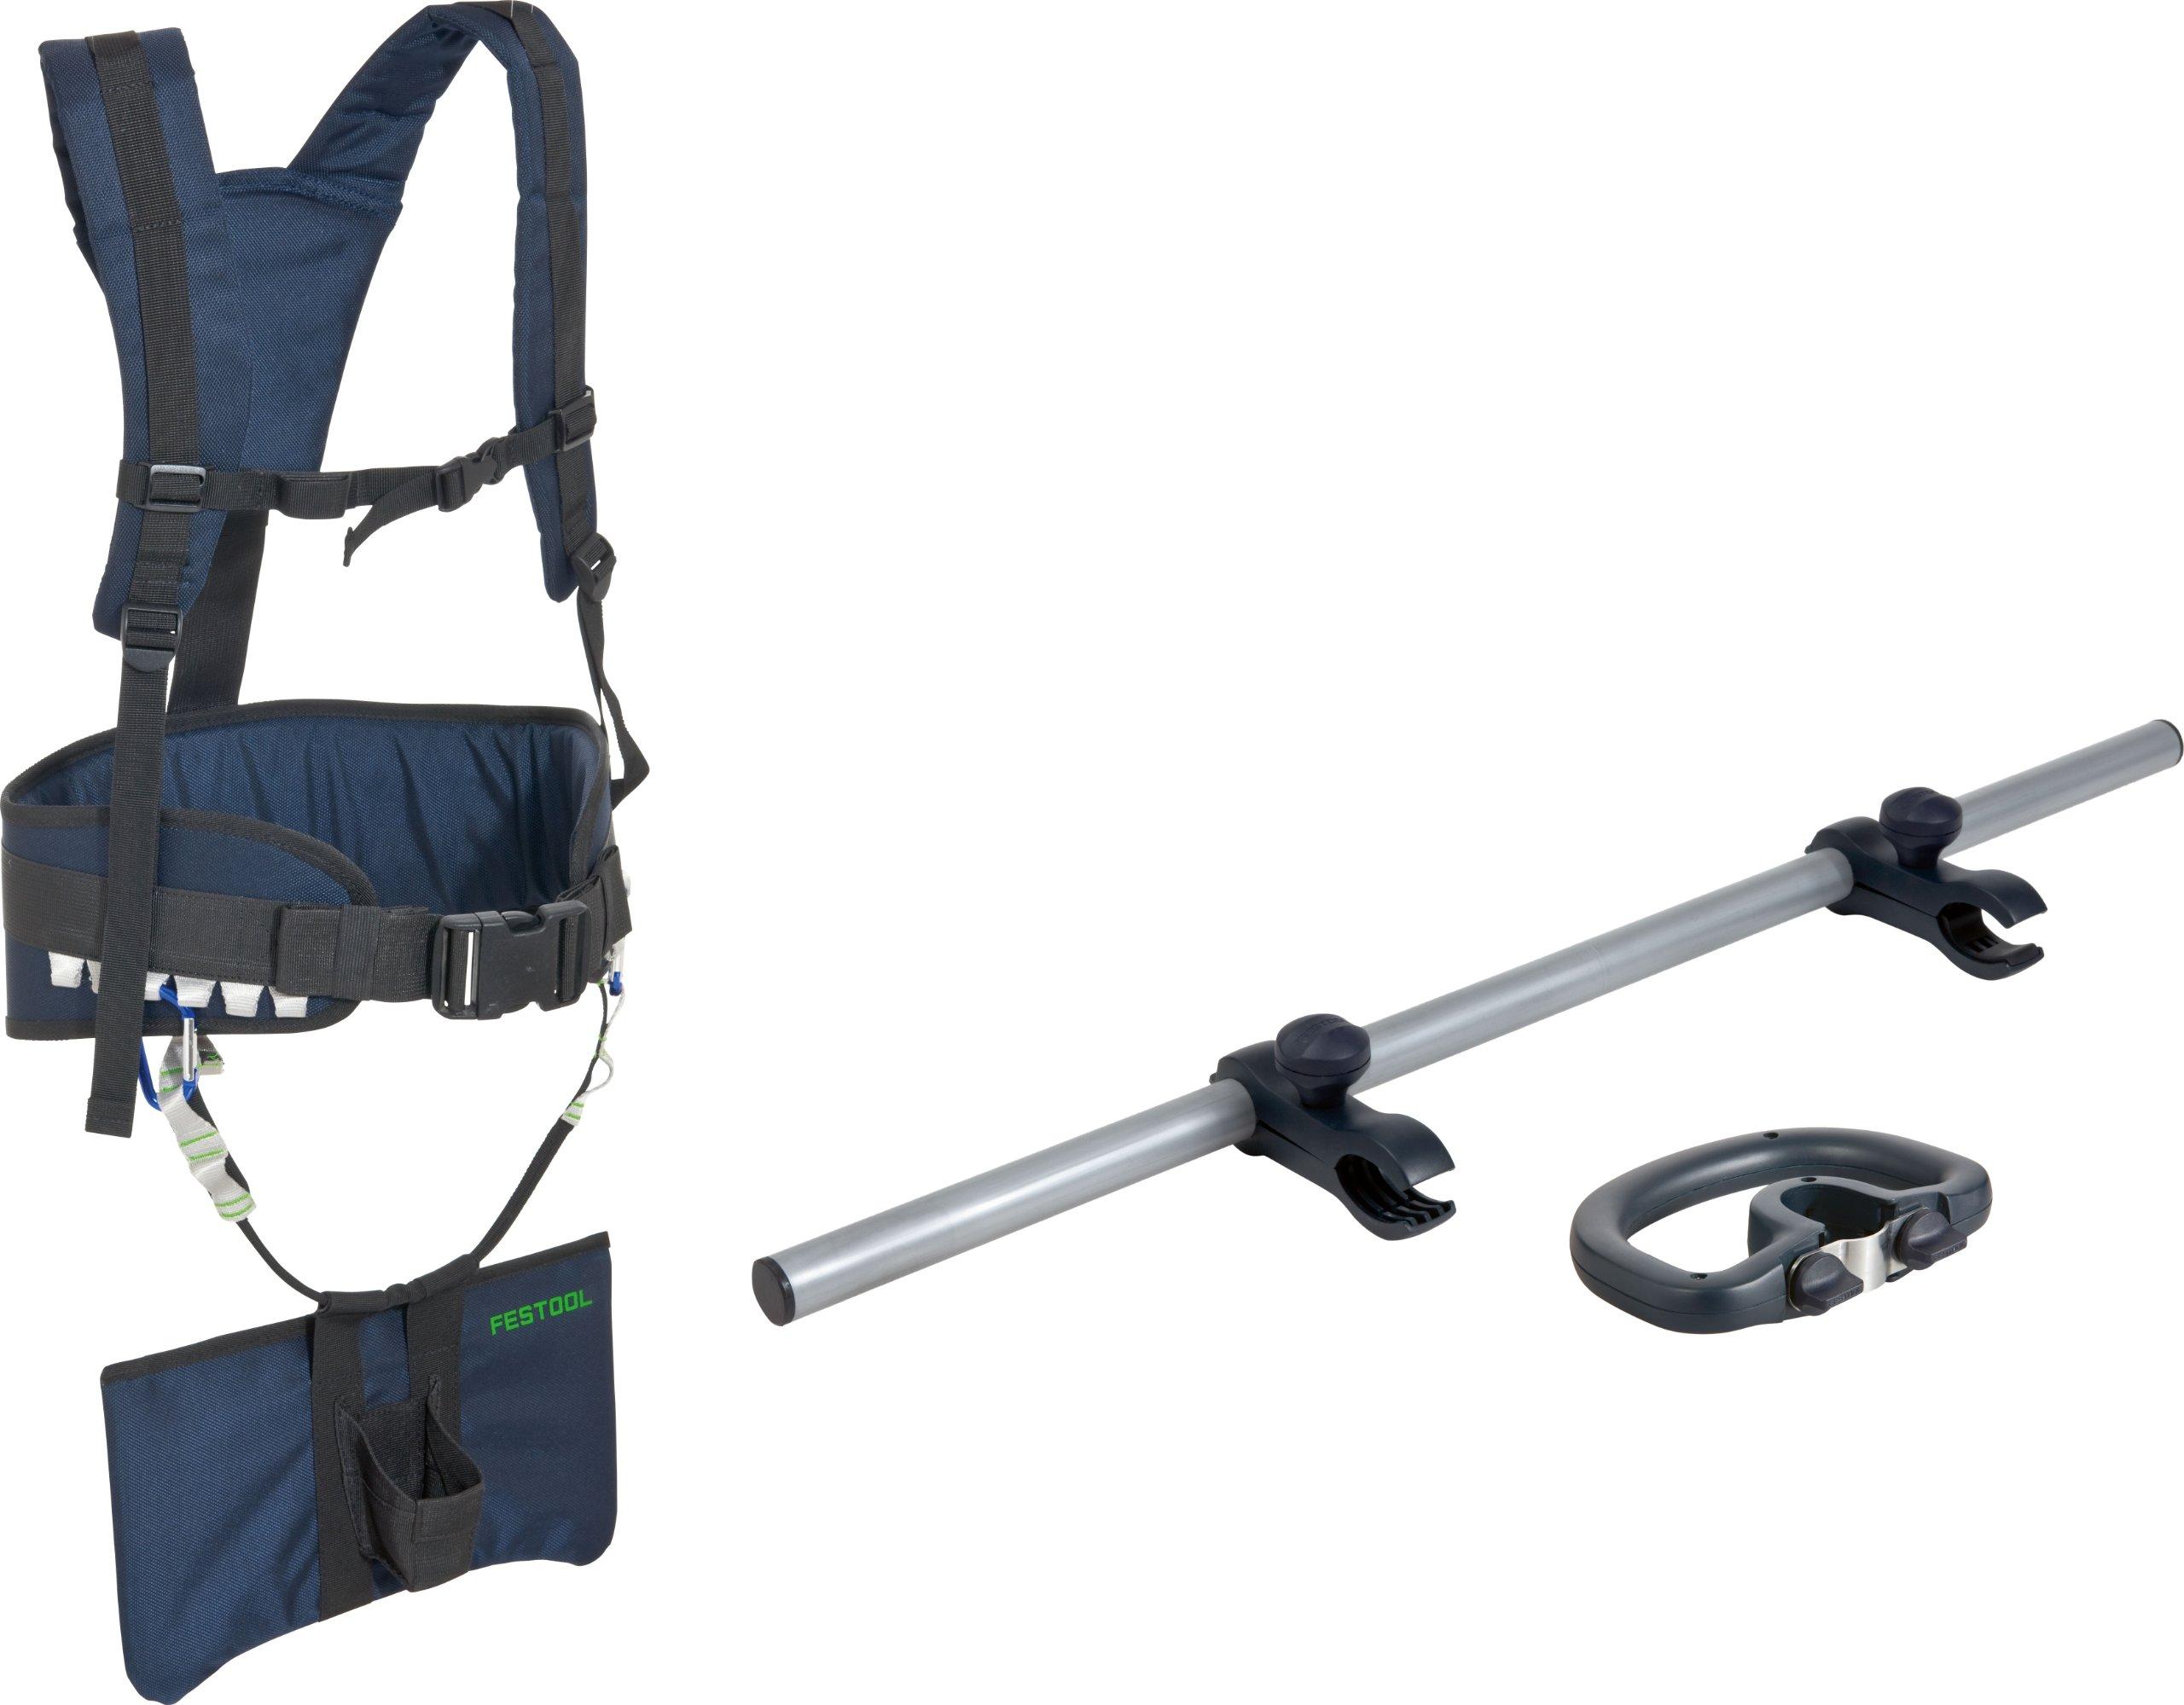 Festool 496911 PLANEX Drywall Sander Support Harness